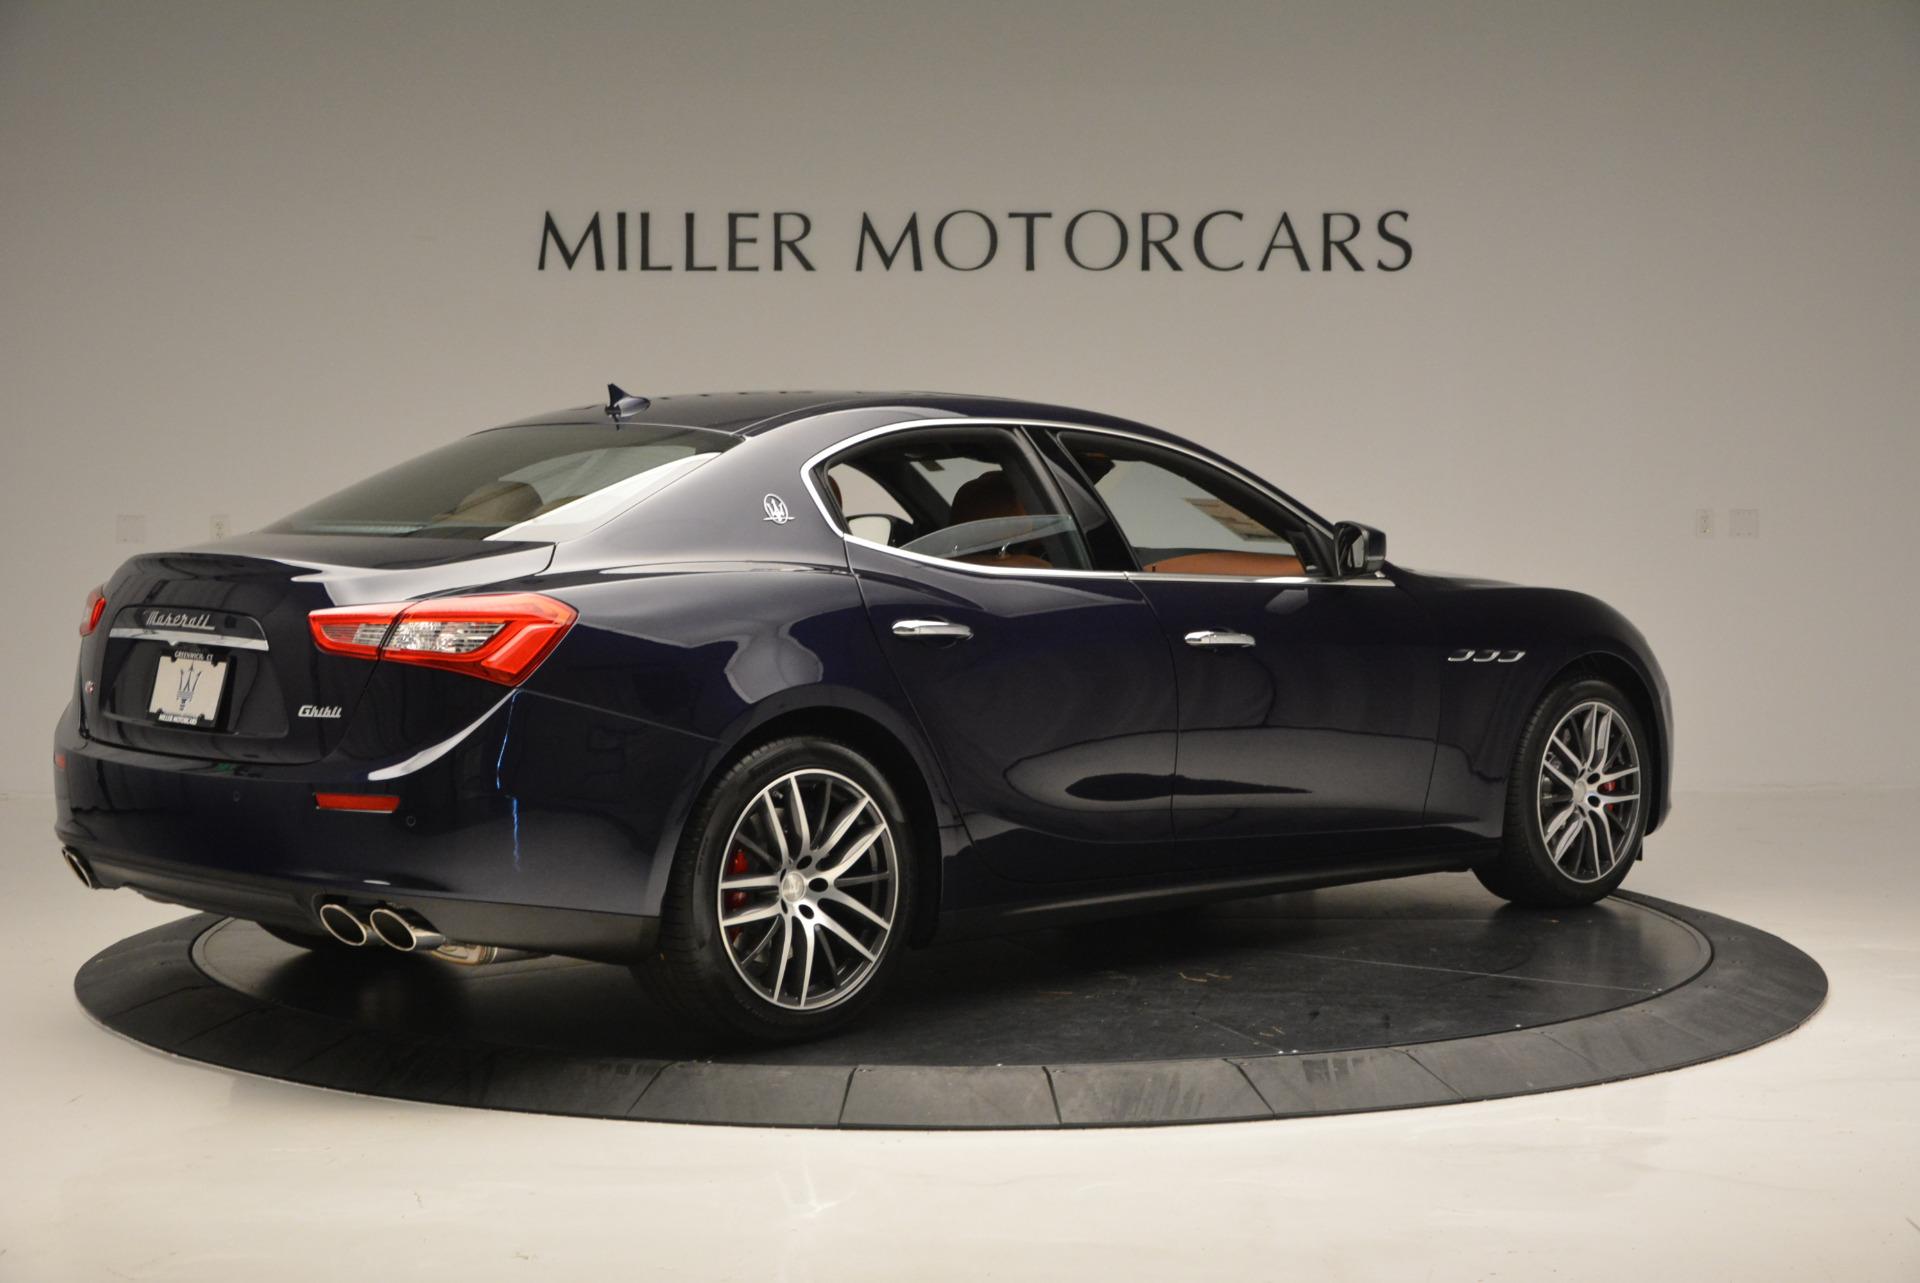 Used 2017 Maserati Ghibli S Q4 - EX Loaner For Sale In Greenwich, CT 568_p8